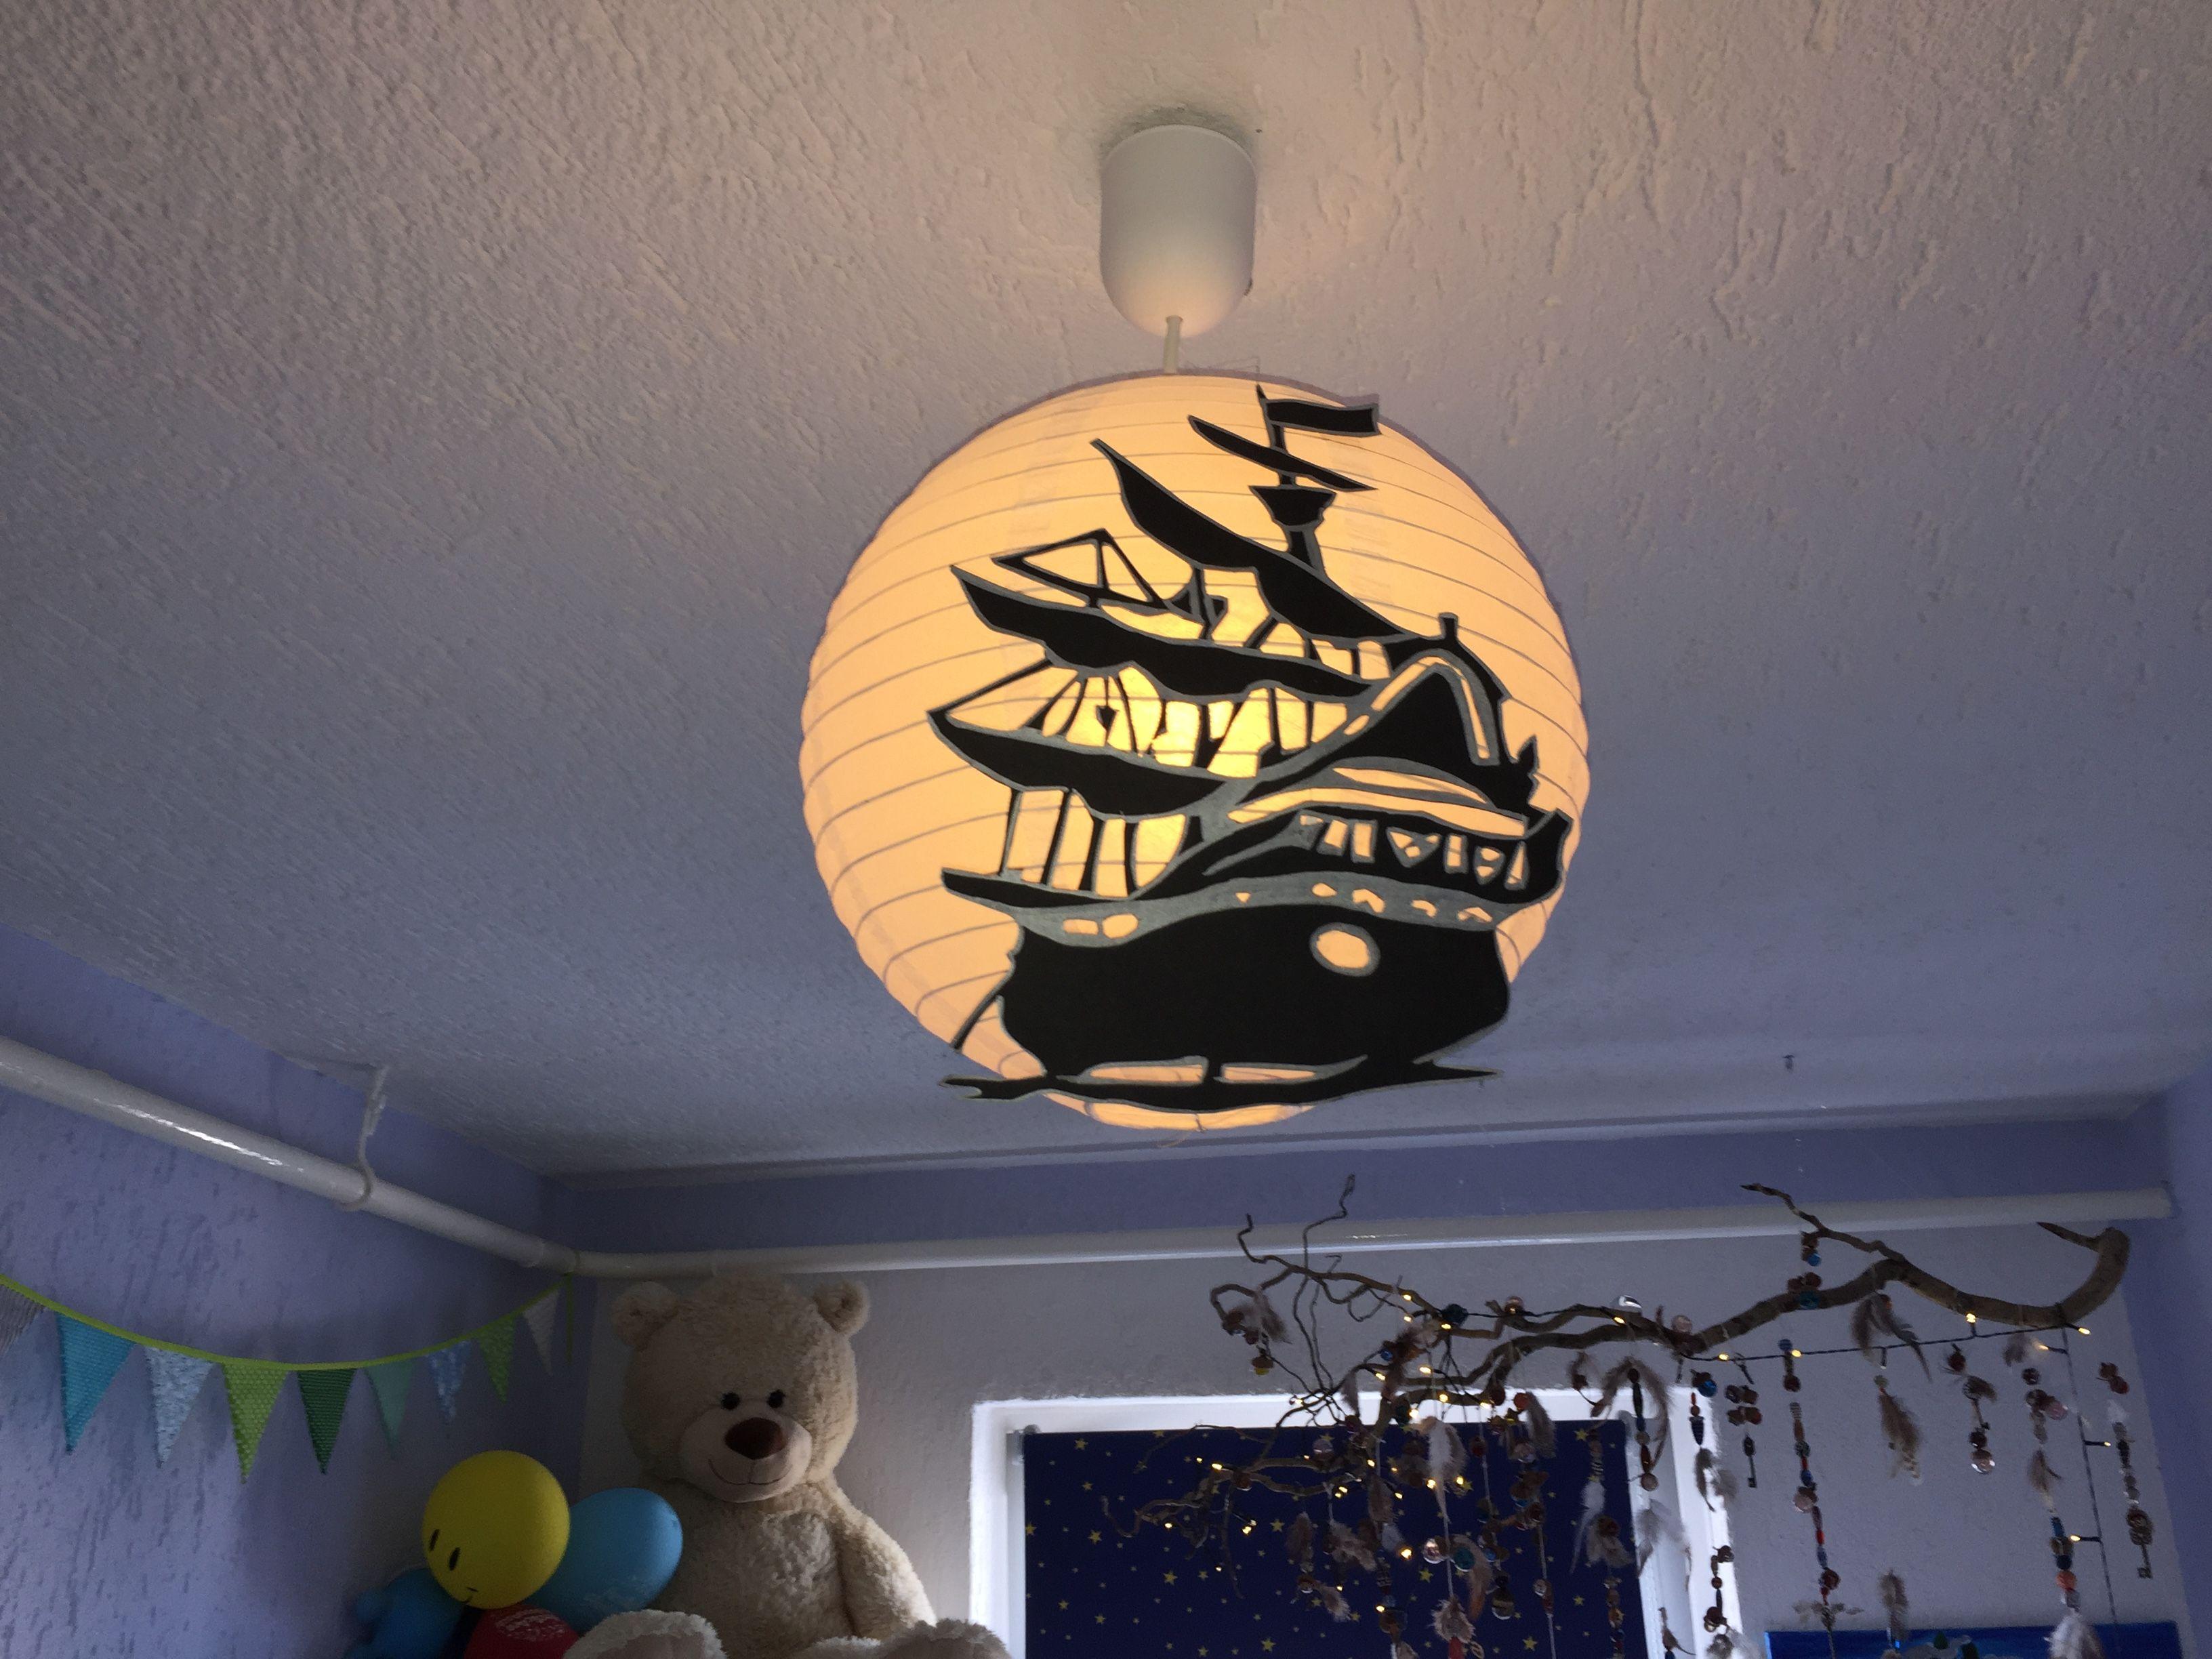 Lampions Kinderzimmer ~ 10 besten peter pan kinderzimmer bilder auf pinterest peter pan